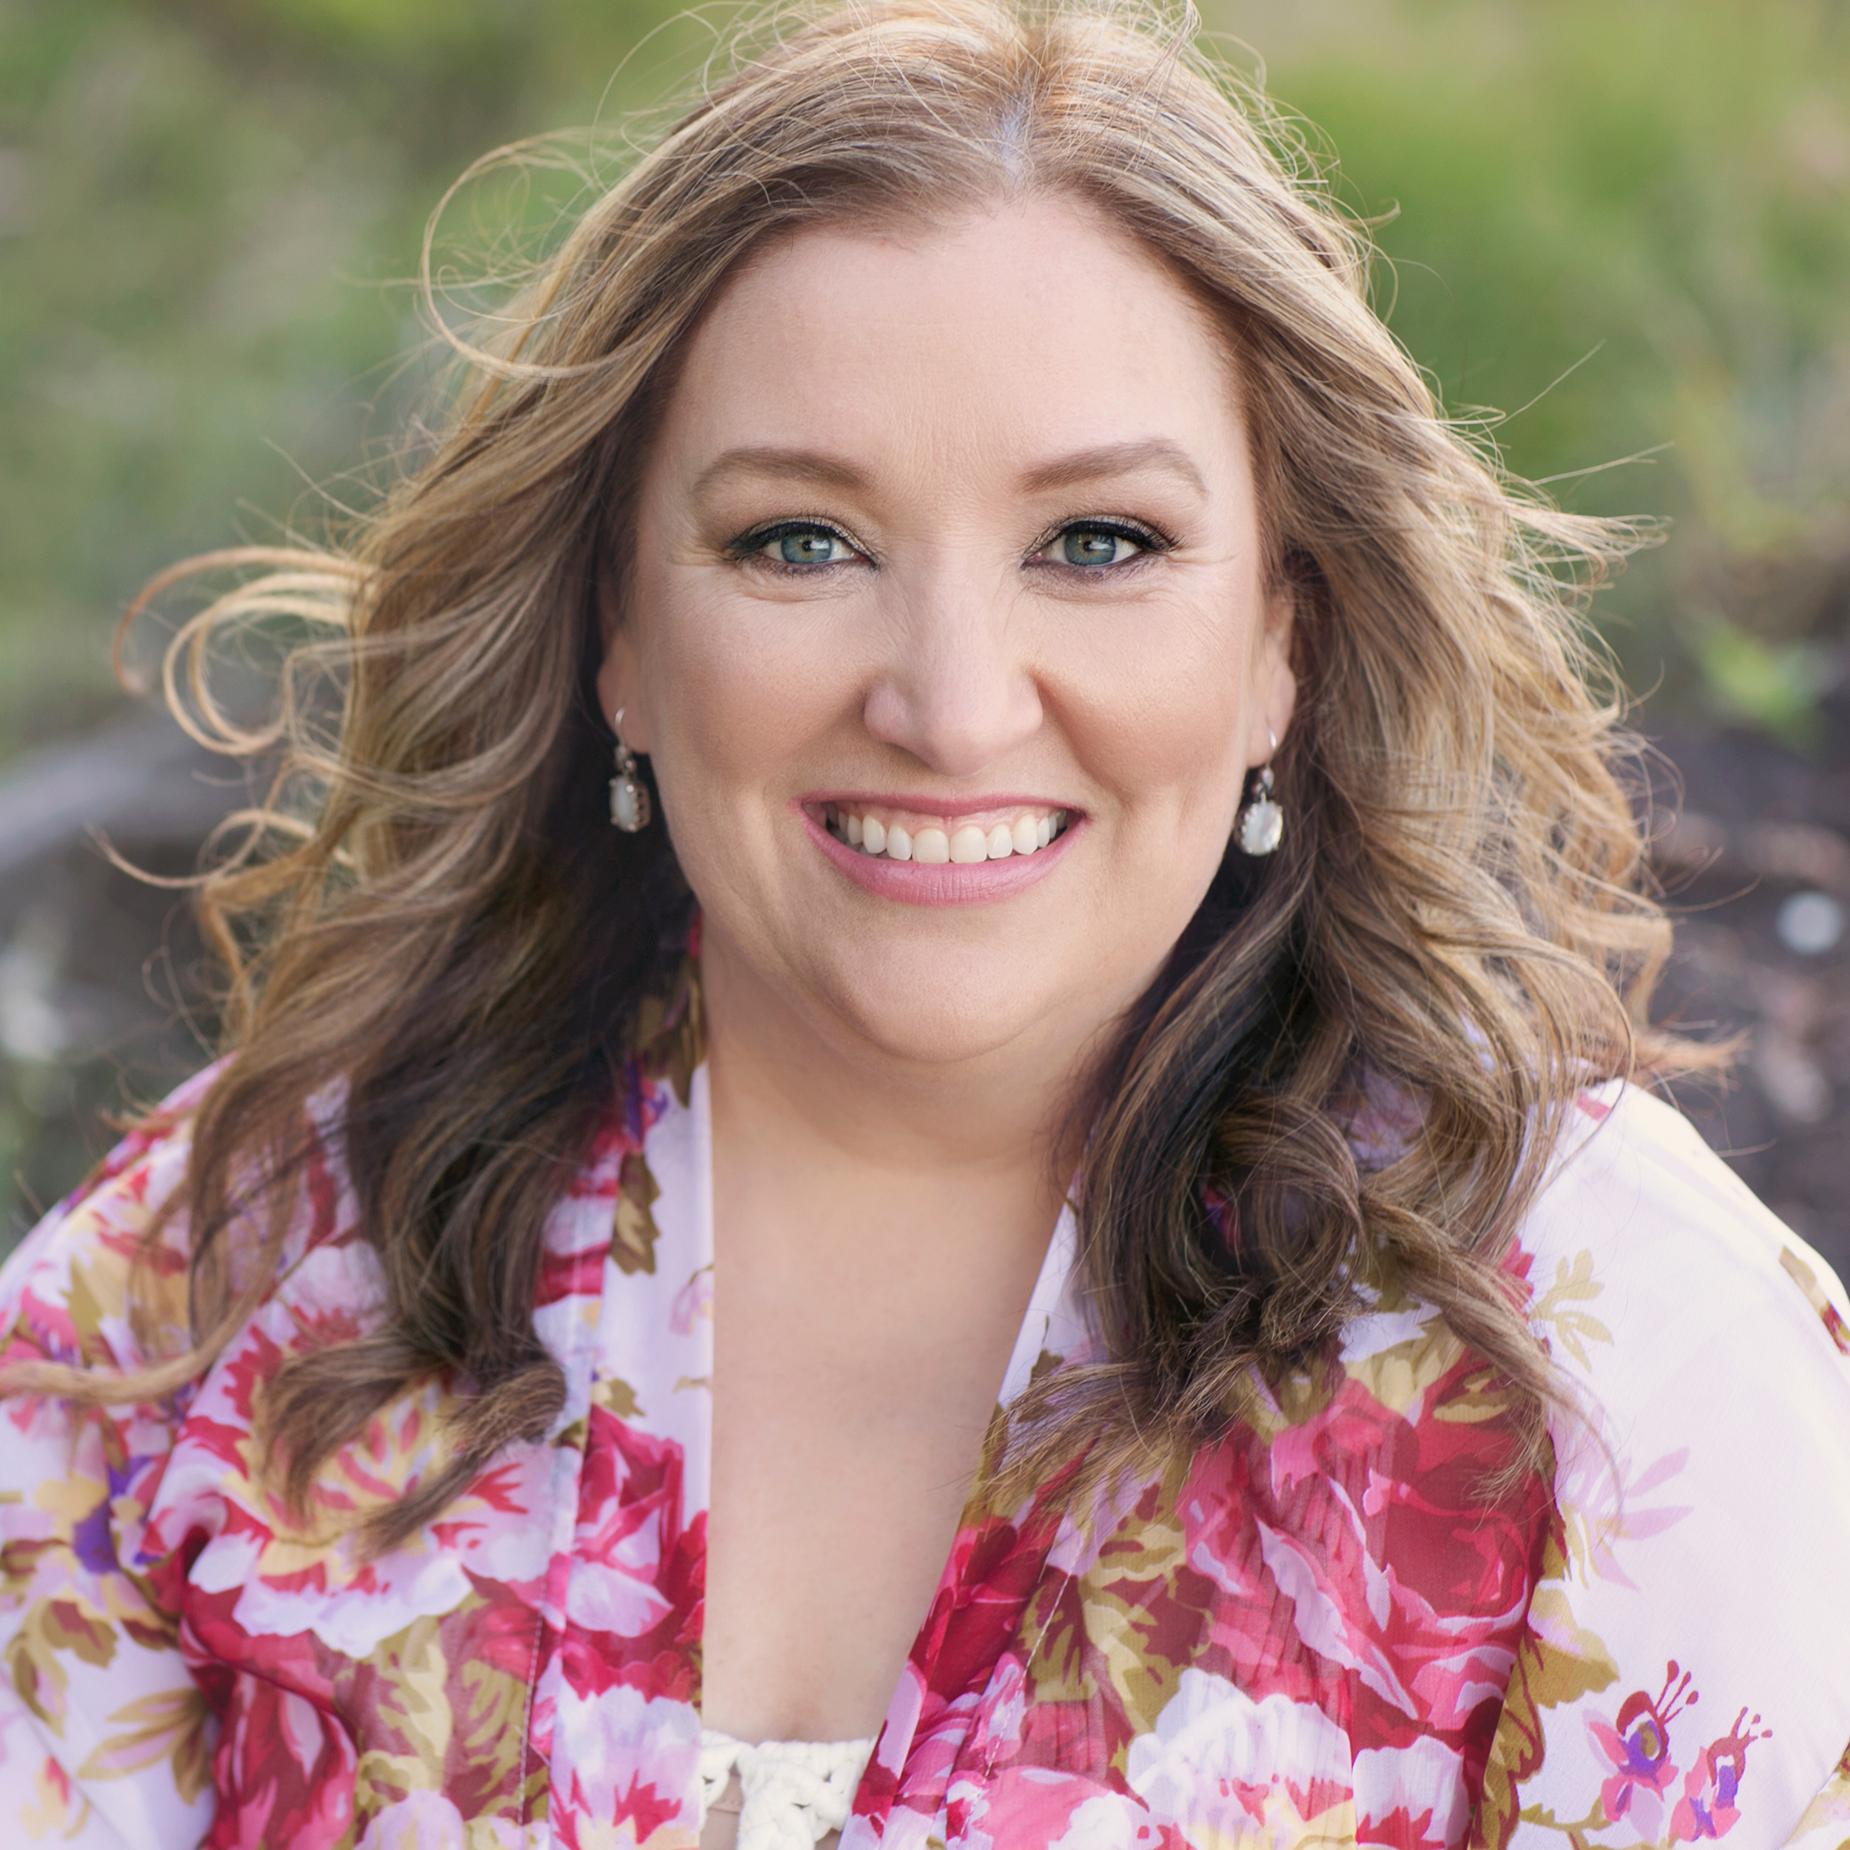 Julie Parker Beautiful You Coaching Academy robynpatton.com